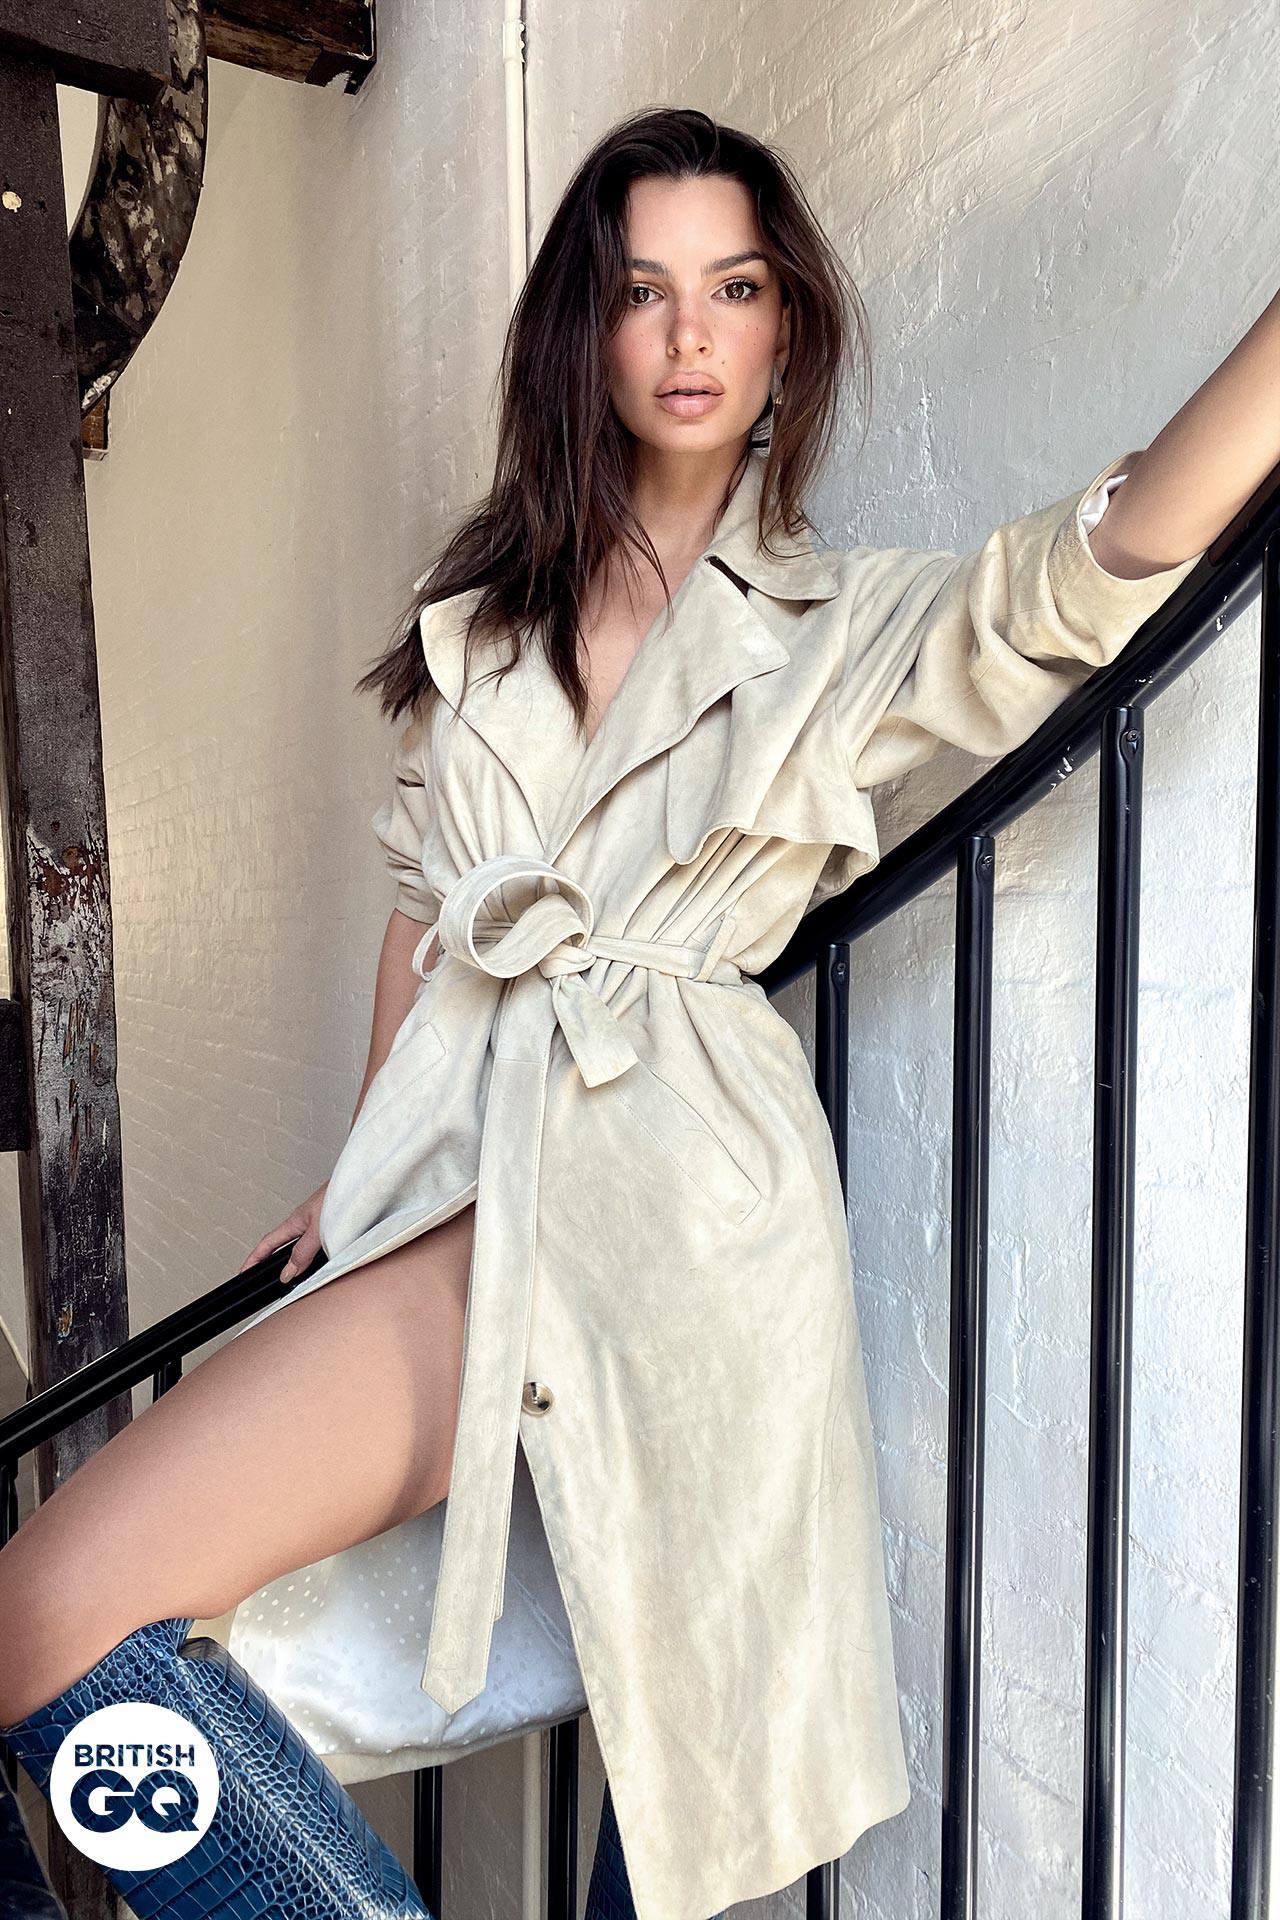 Emily Ratajkowski – Sexy In Gq Magazine Photoshoot (may 2020) 0004